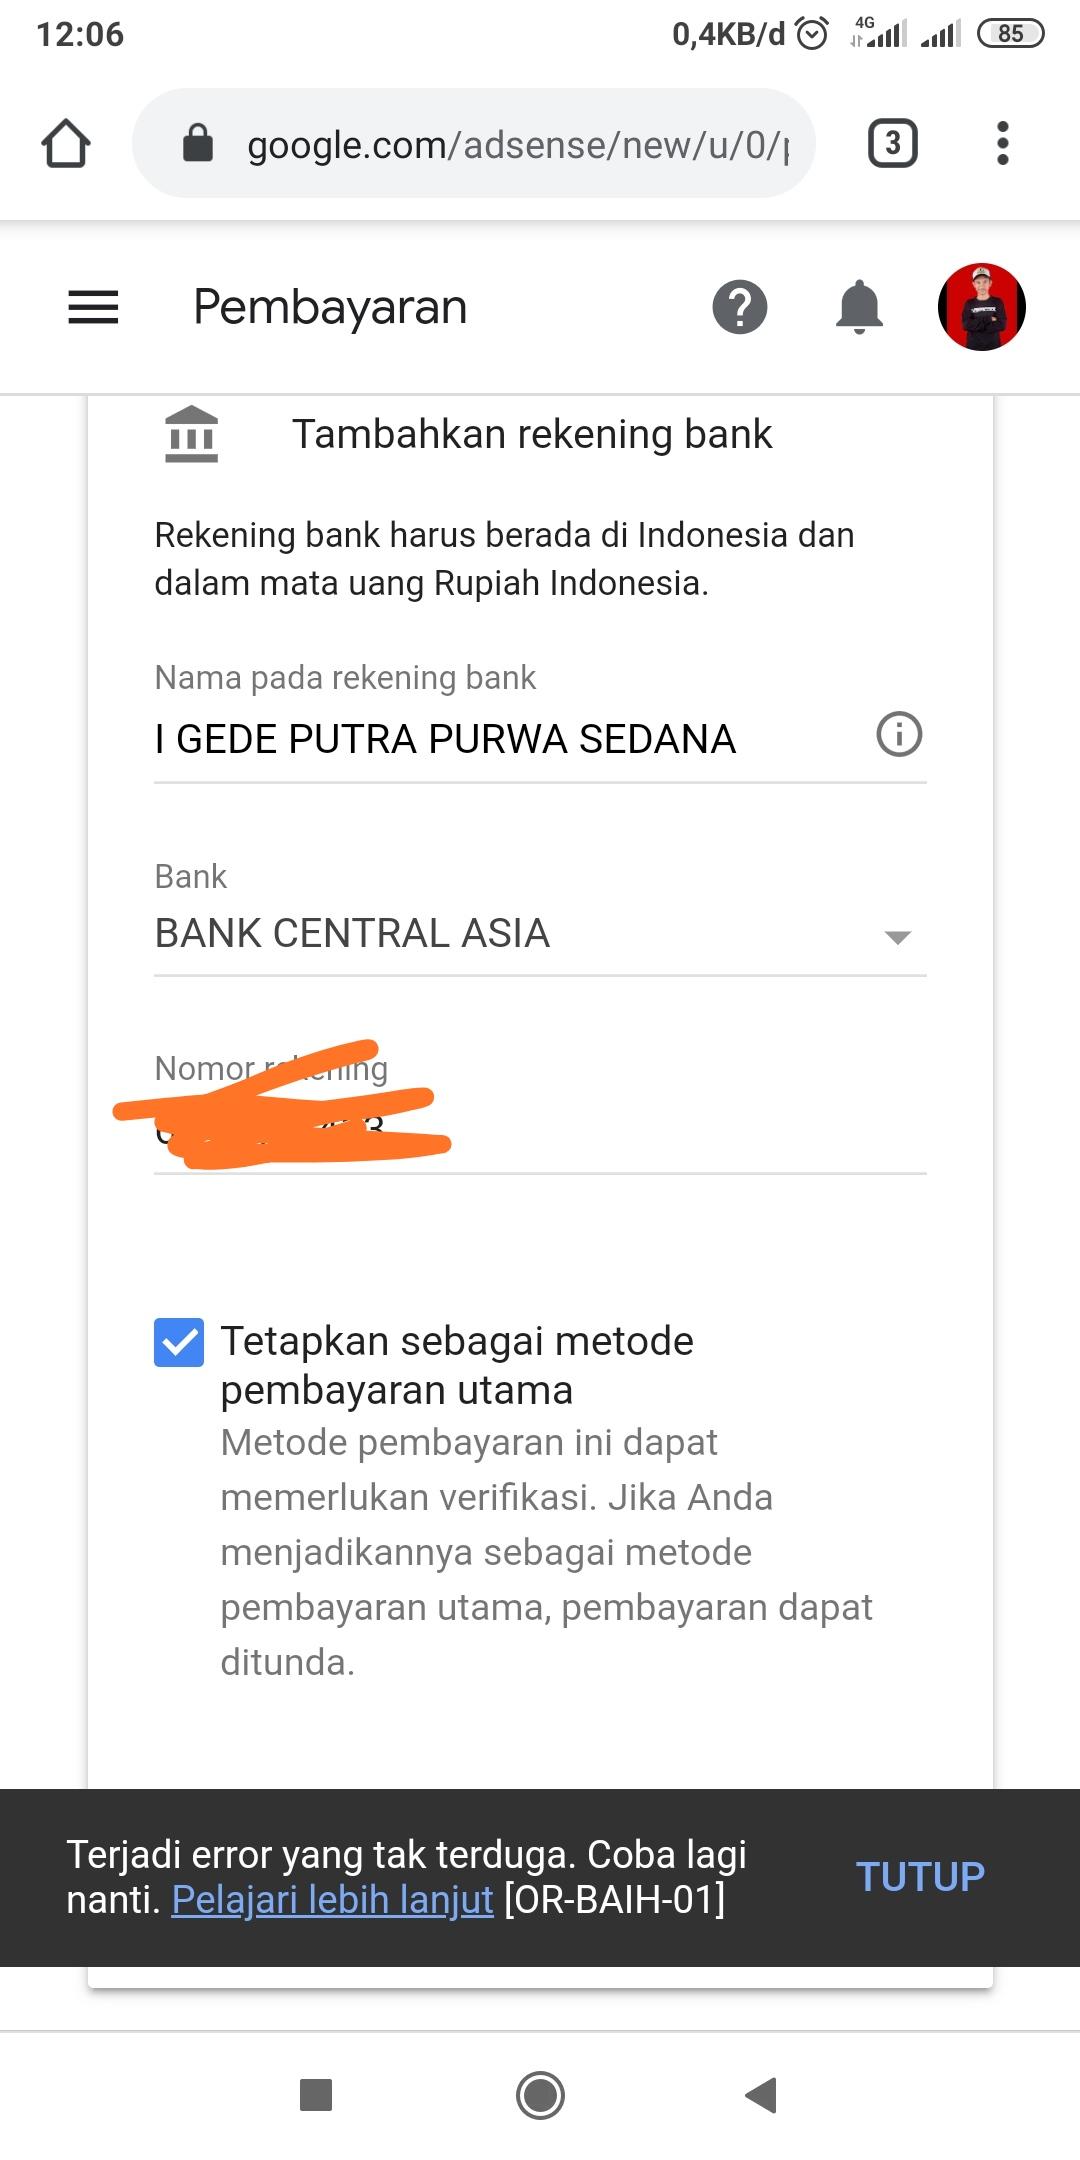 Error Or Baih 01 Google Play Community